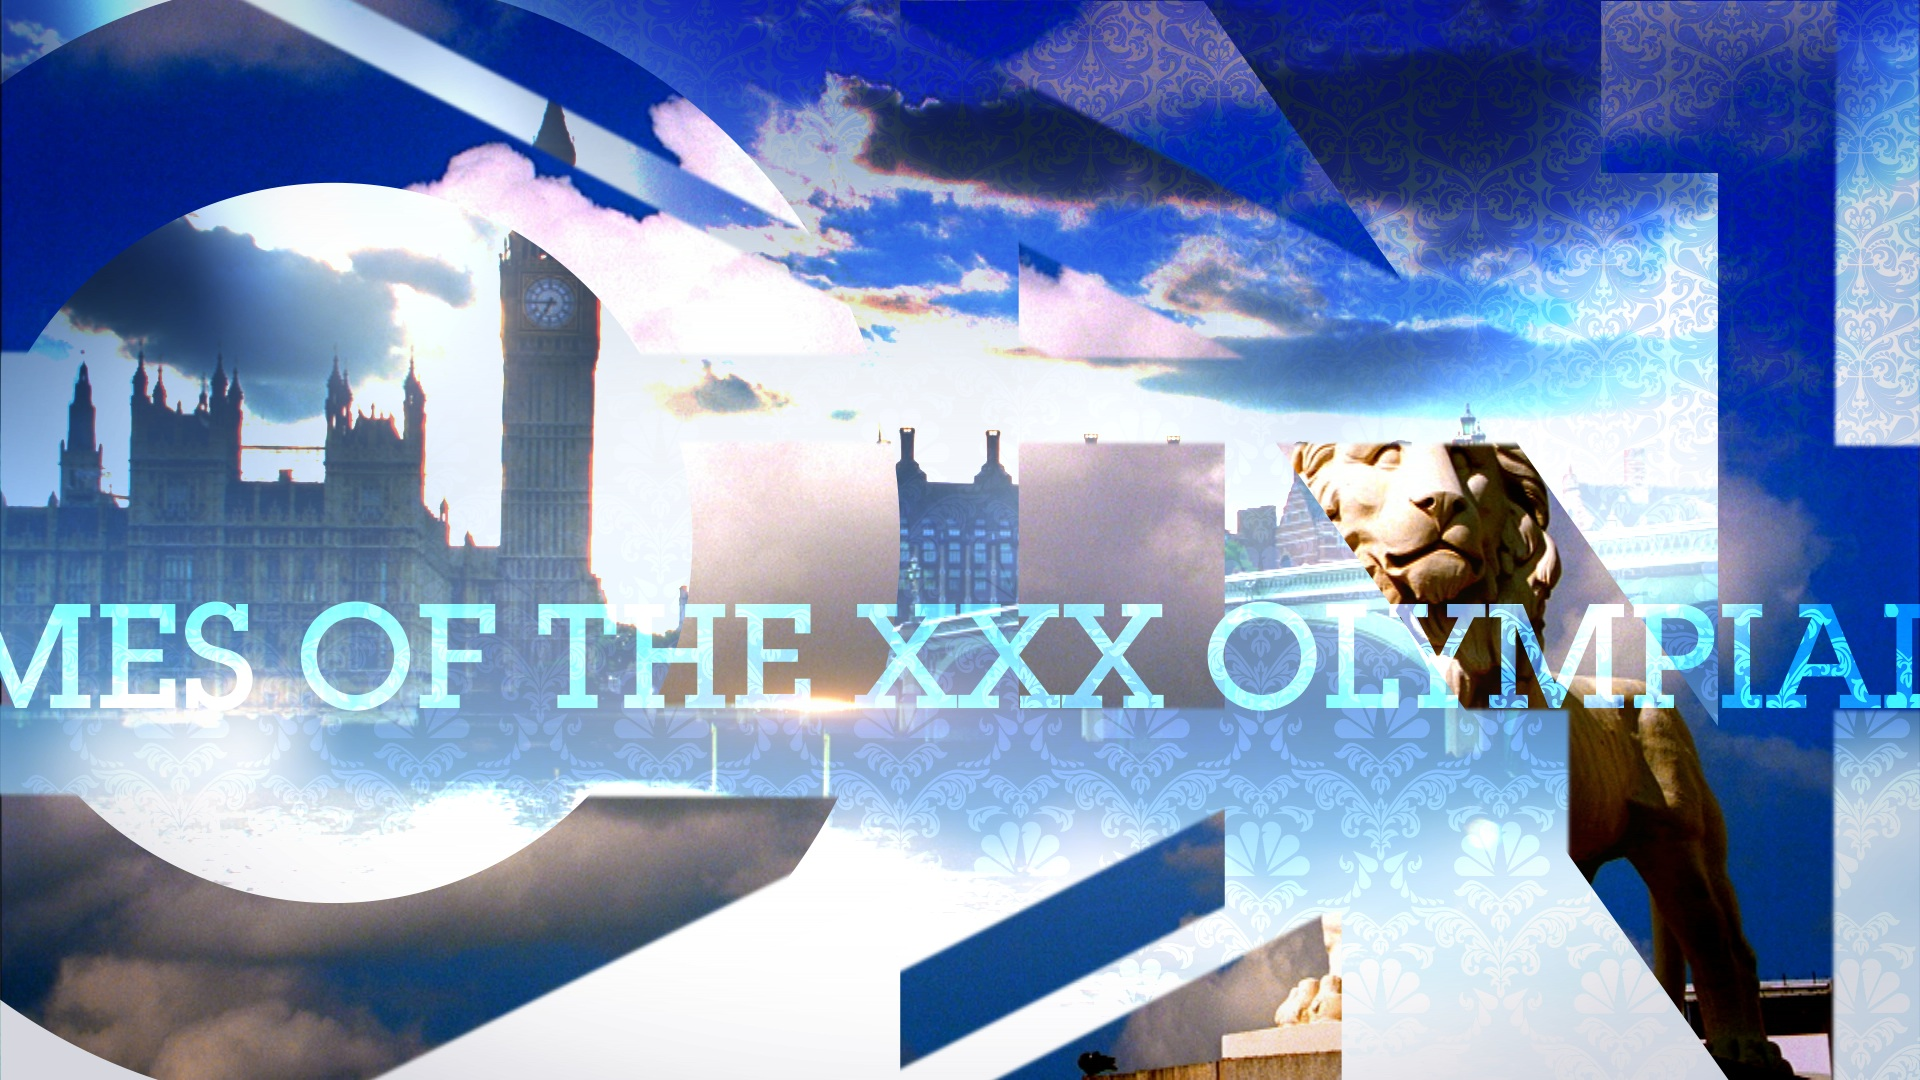 Games of the XXX Olympiad - NBC SPORTS & OLYMPICS